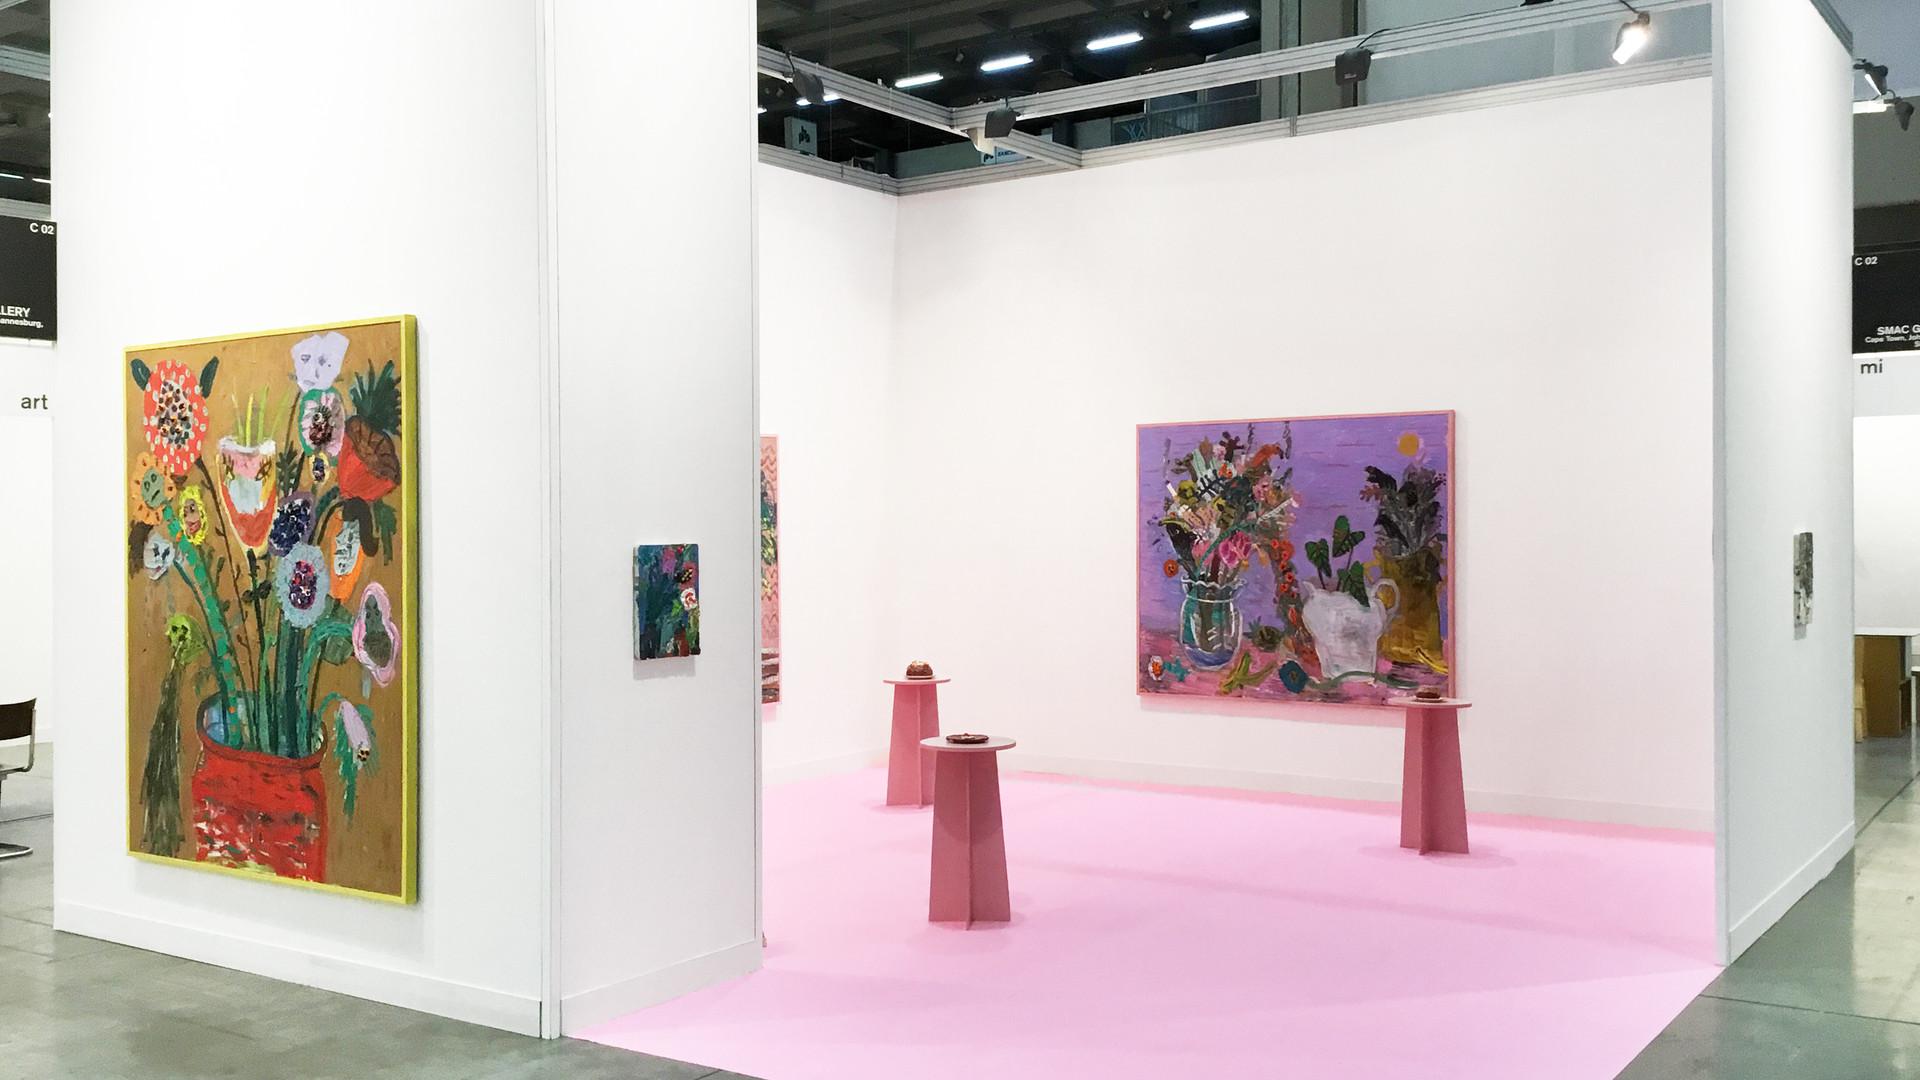 Georgina Gratrix | MiArt | 2017 | Installation View